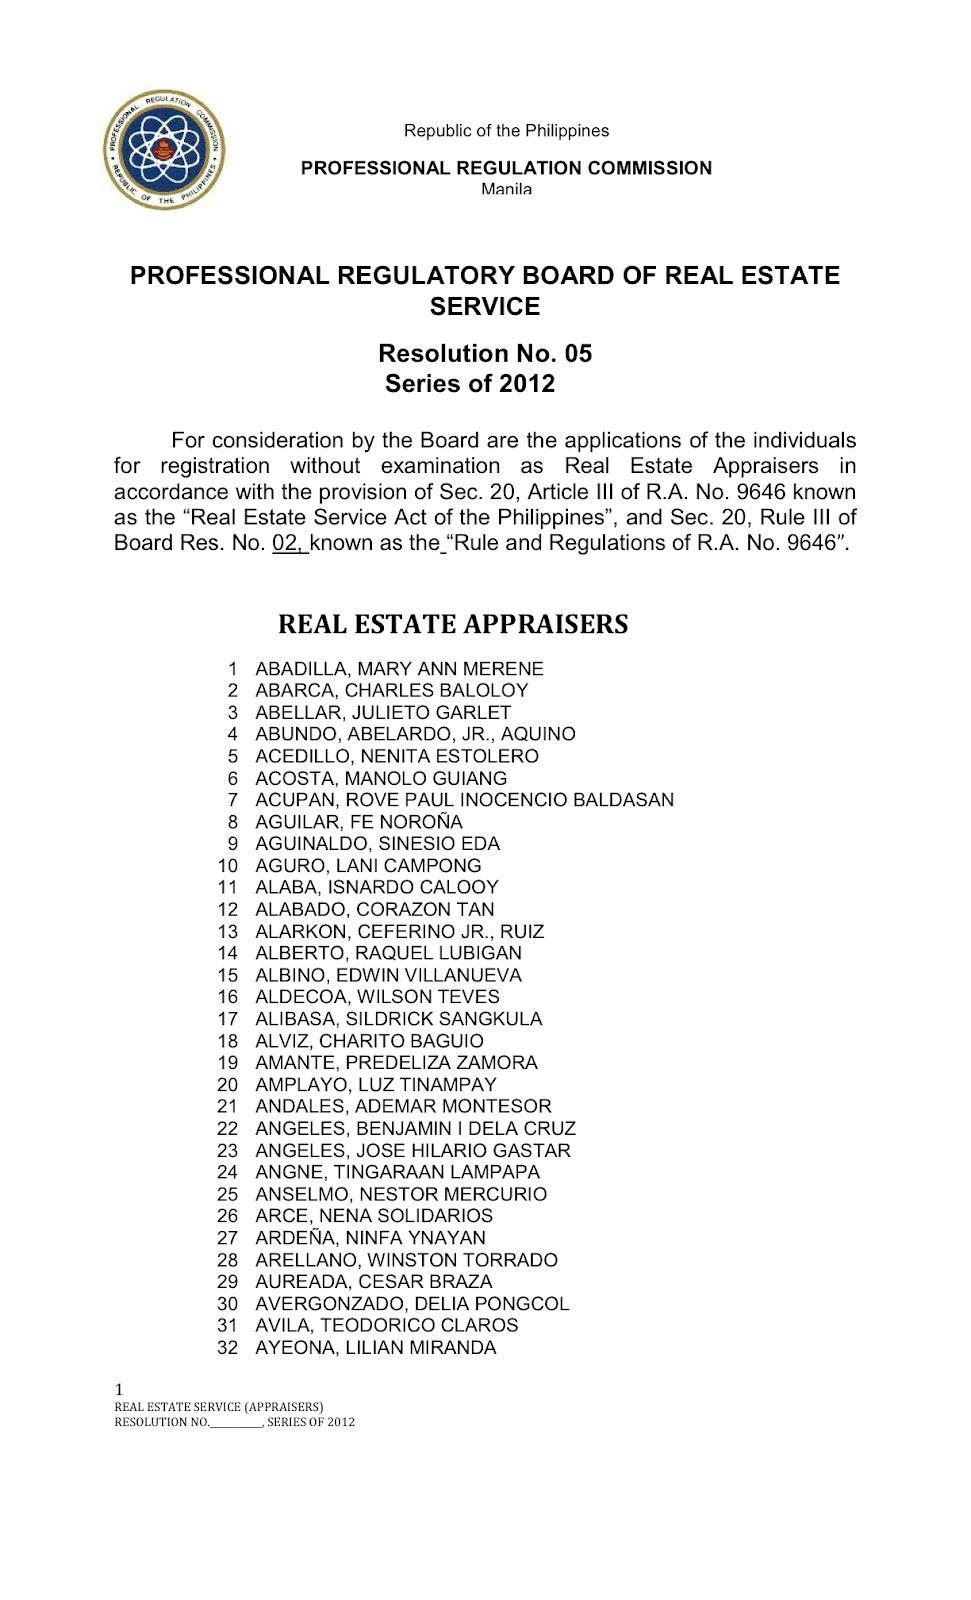 philippine real estate laws pdf